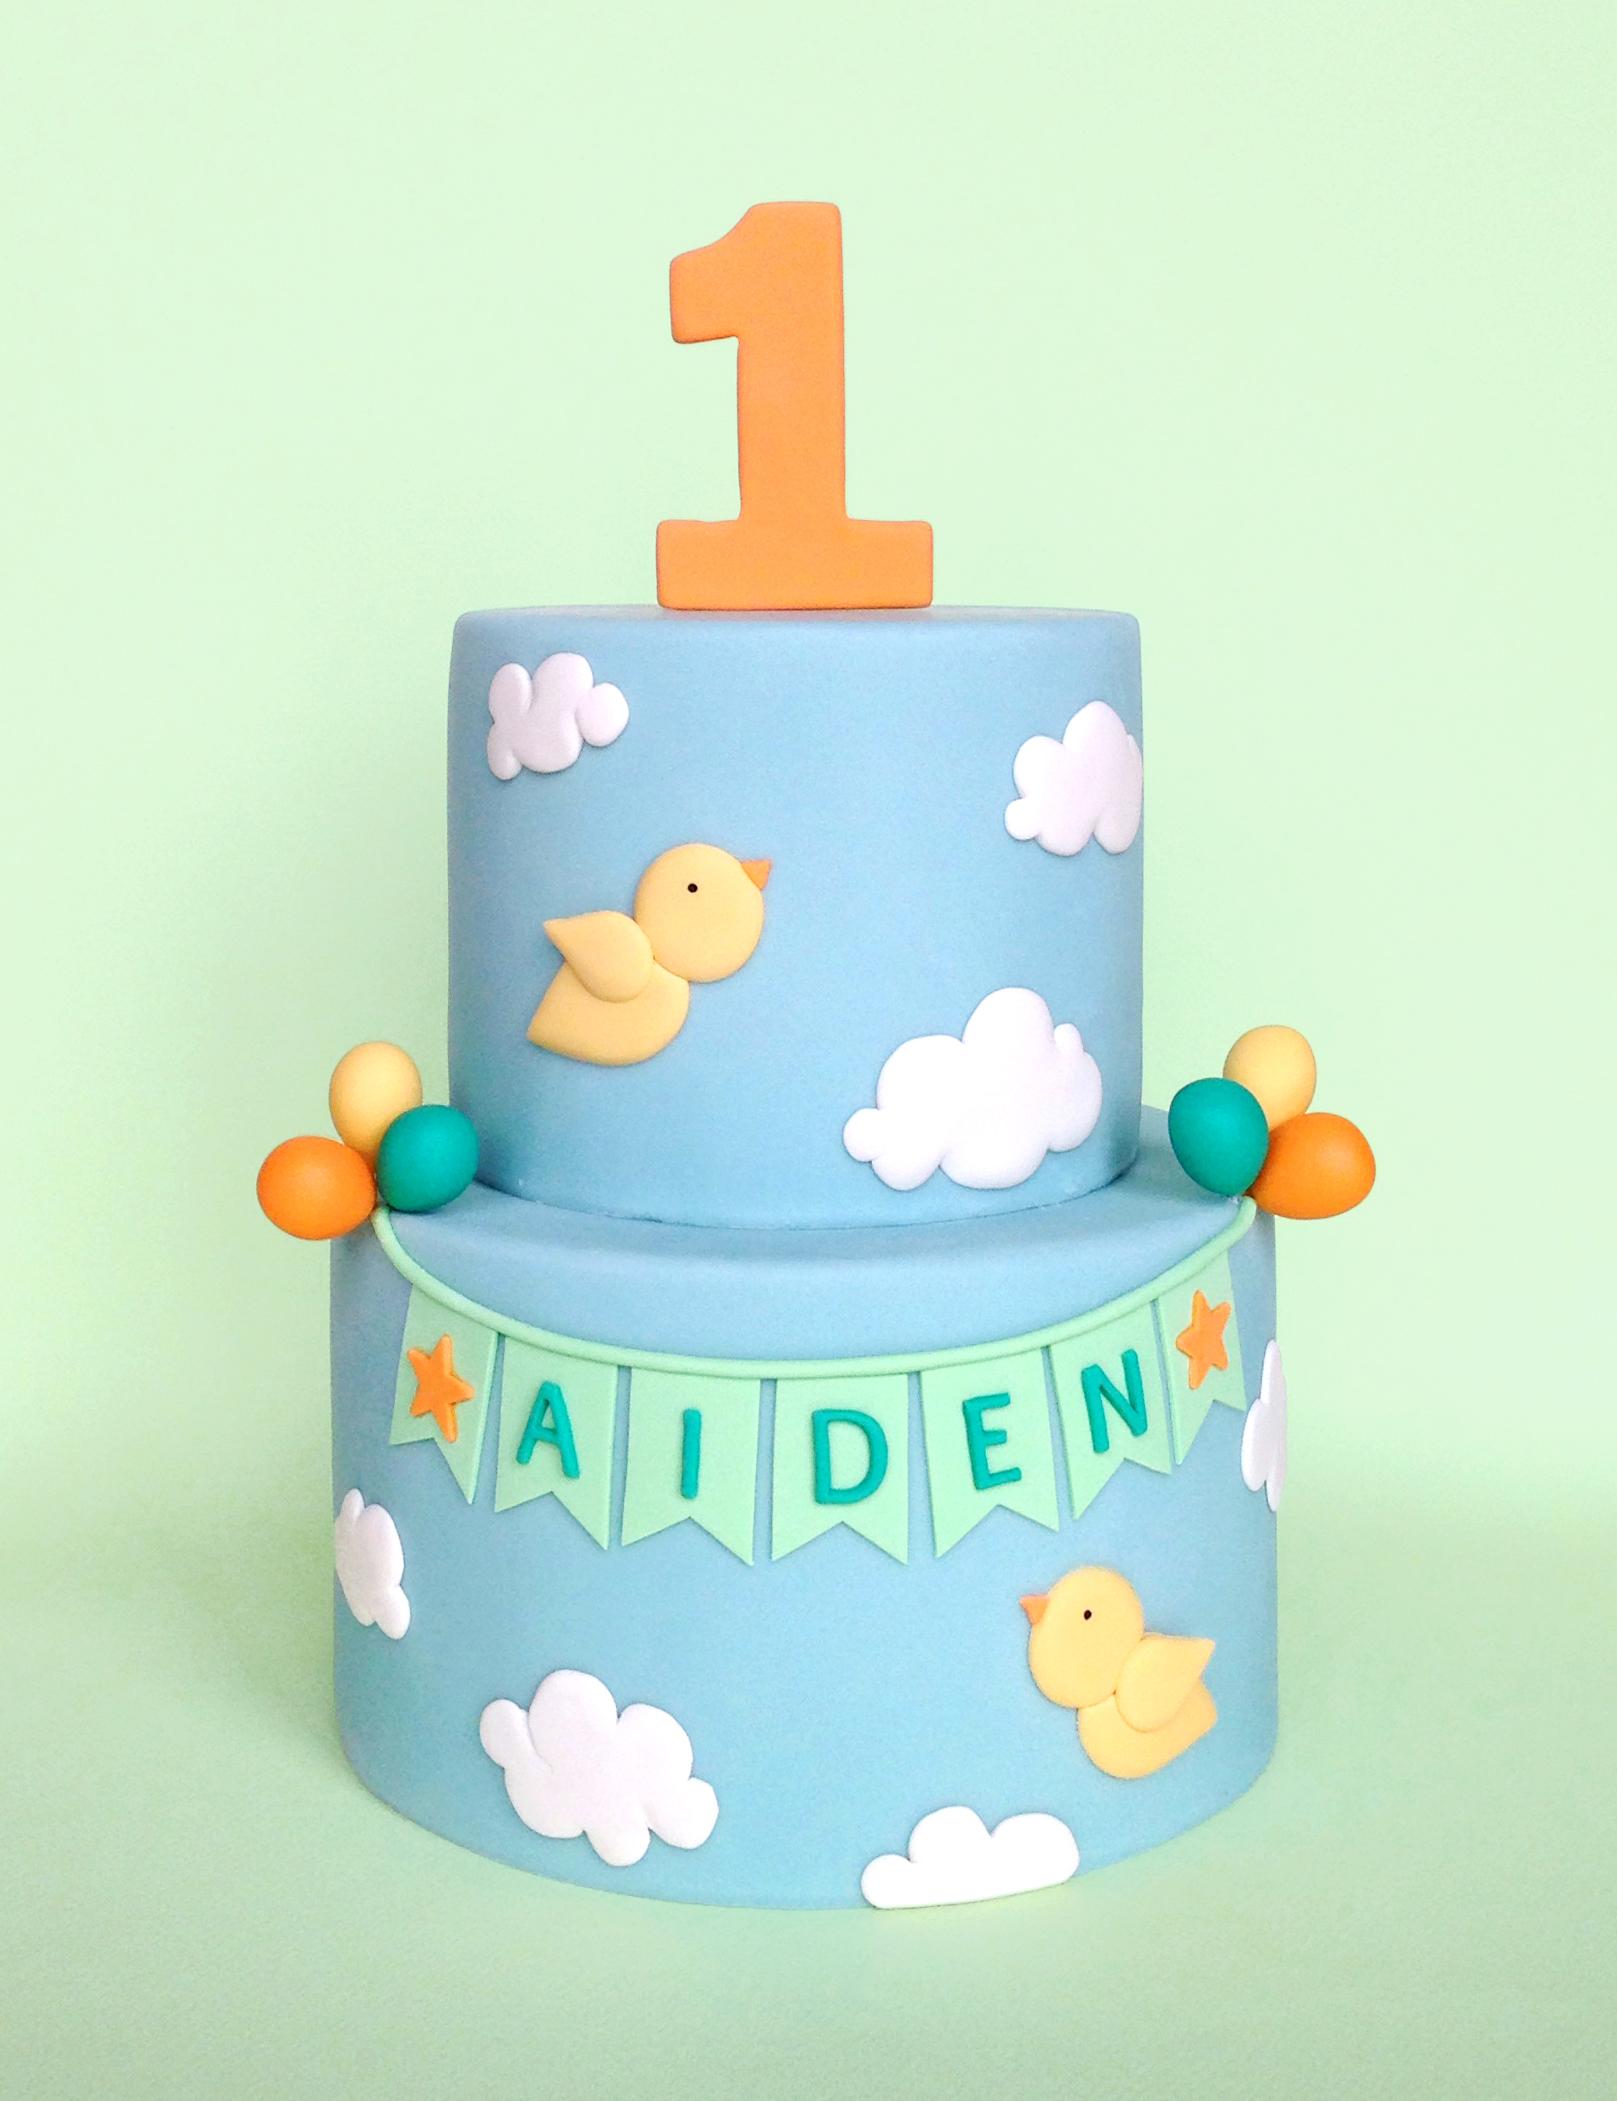 eatcakebemerry_birds_sky_clouds_cake.jpg